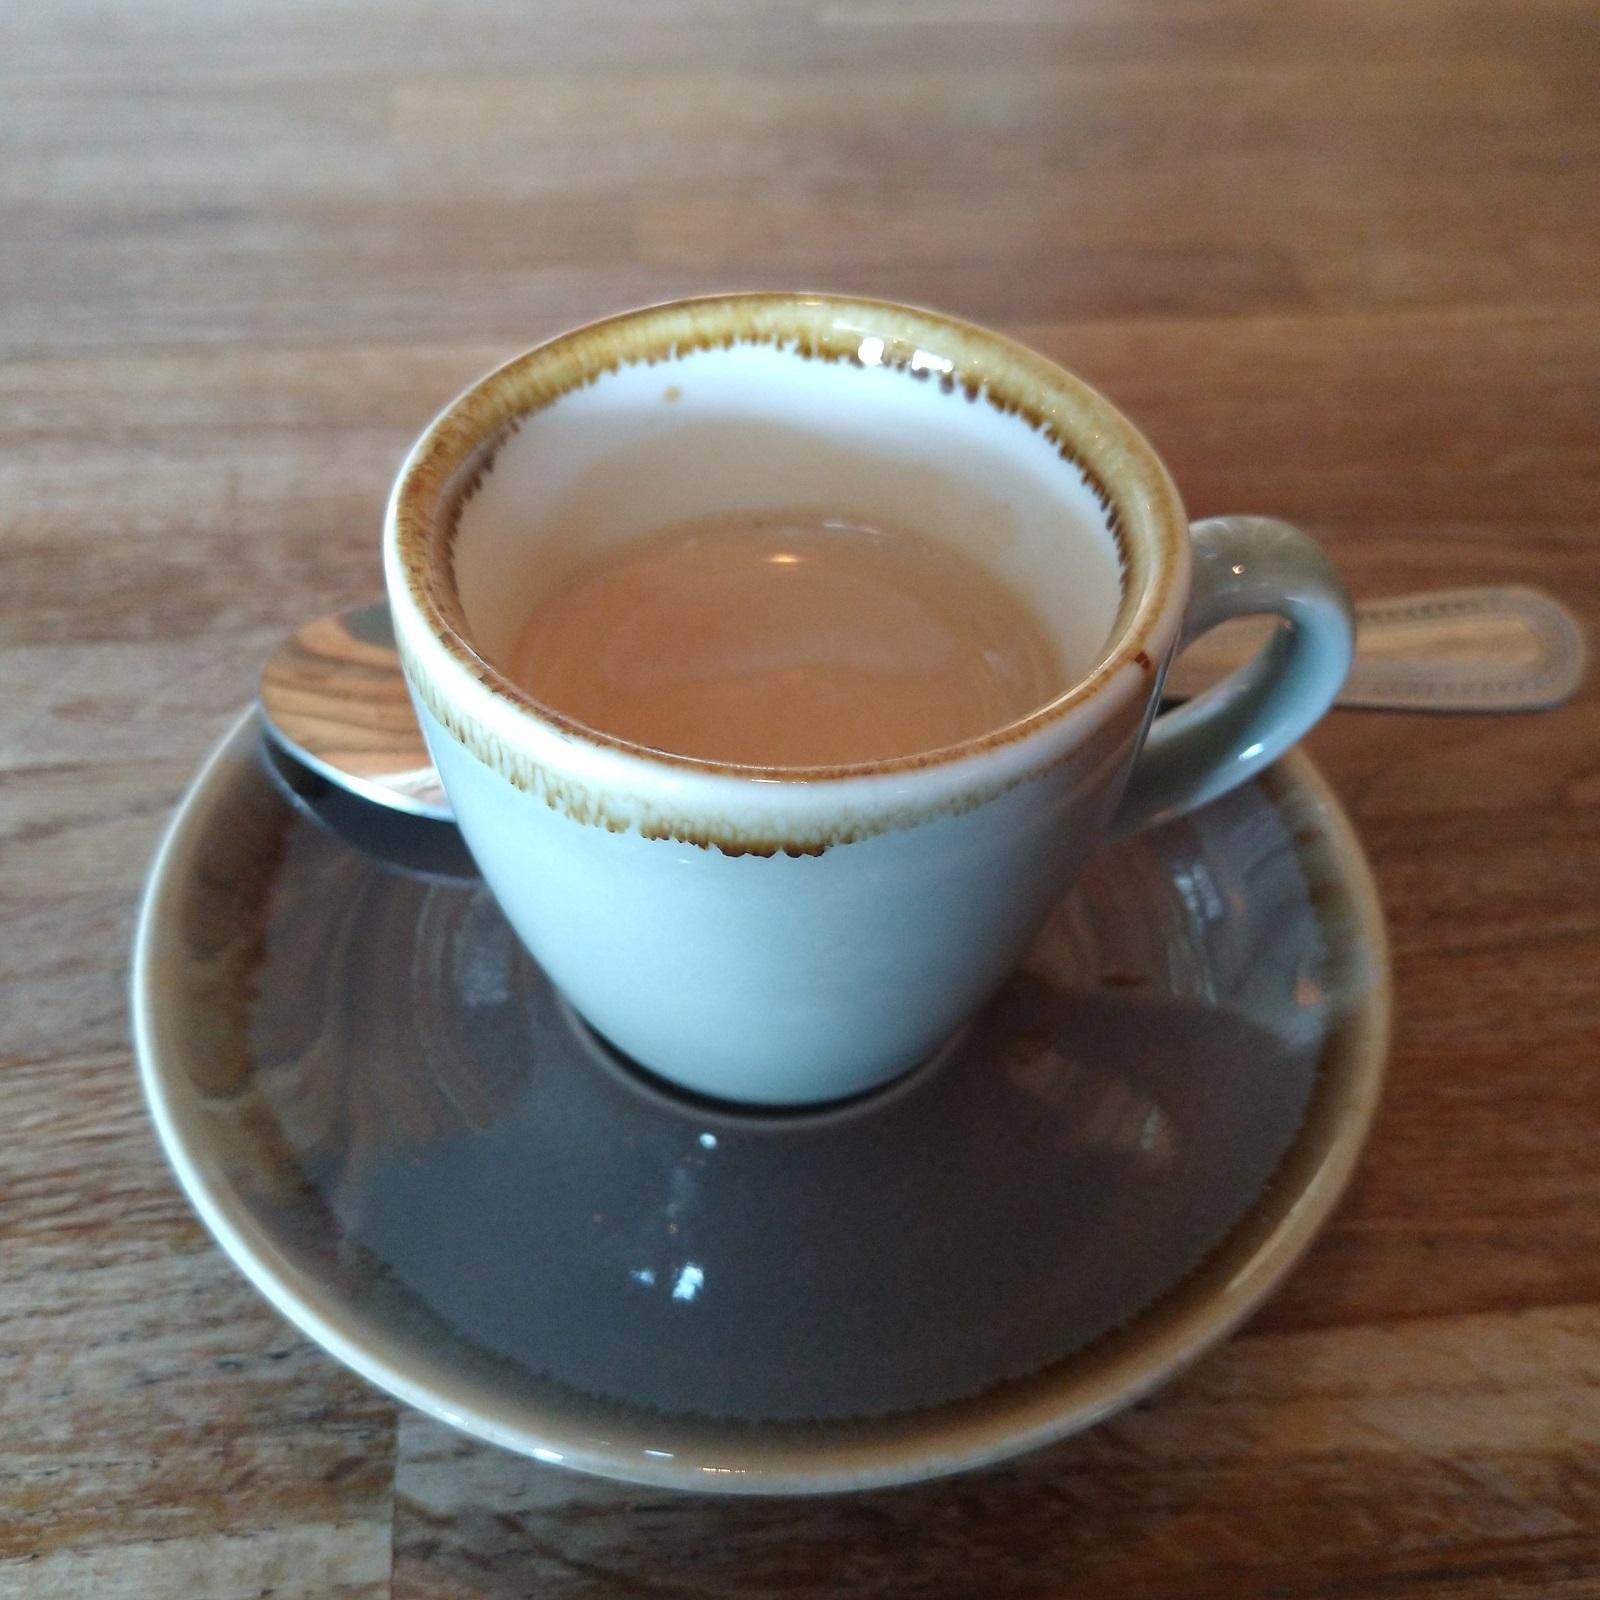 A classic espresso in a classic cup at Elephant Lounge in Parkgate.